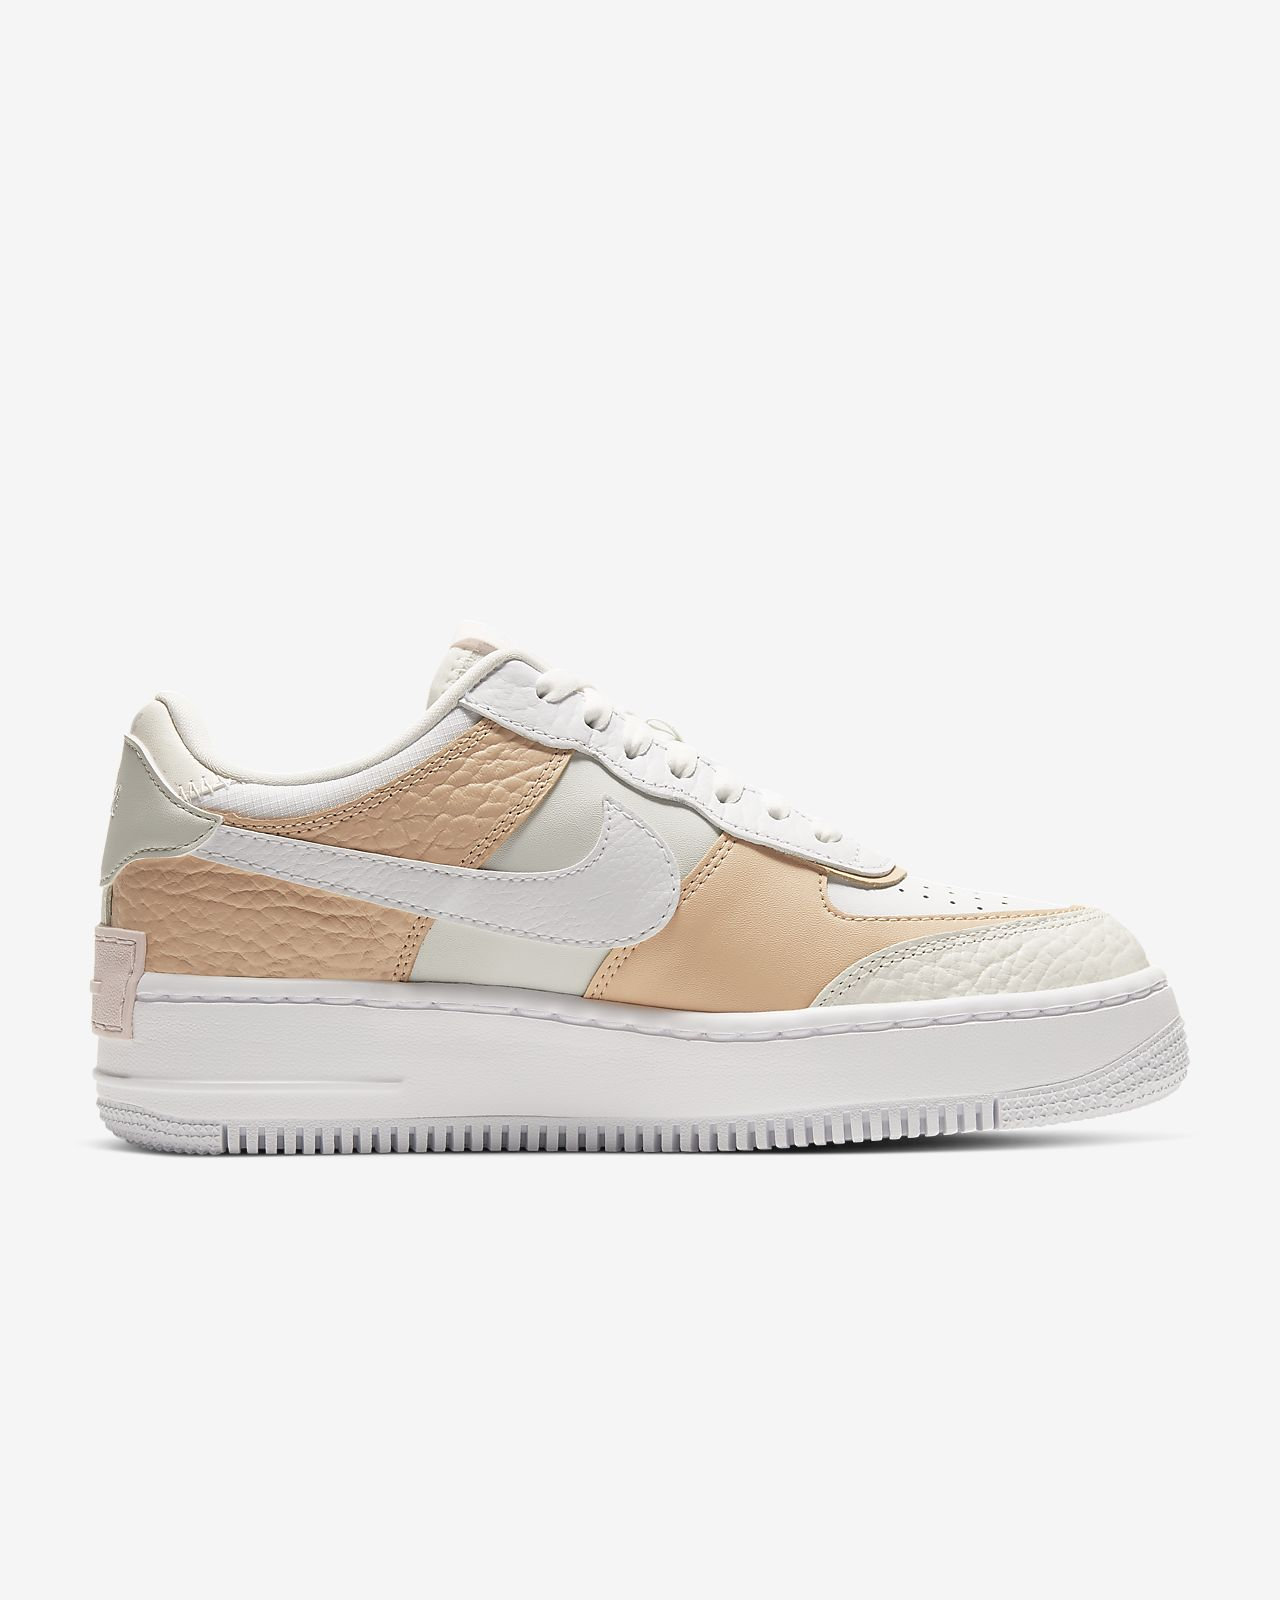 Nike AF 1 Shadow SE Women's Shoe